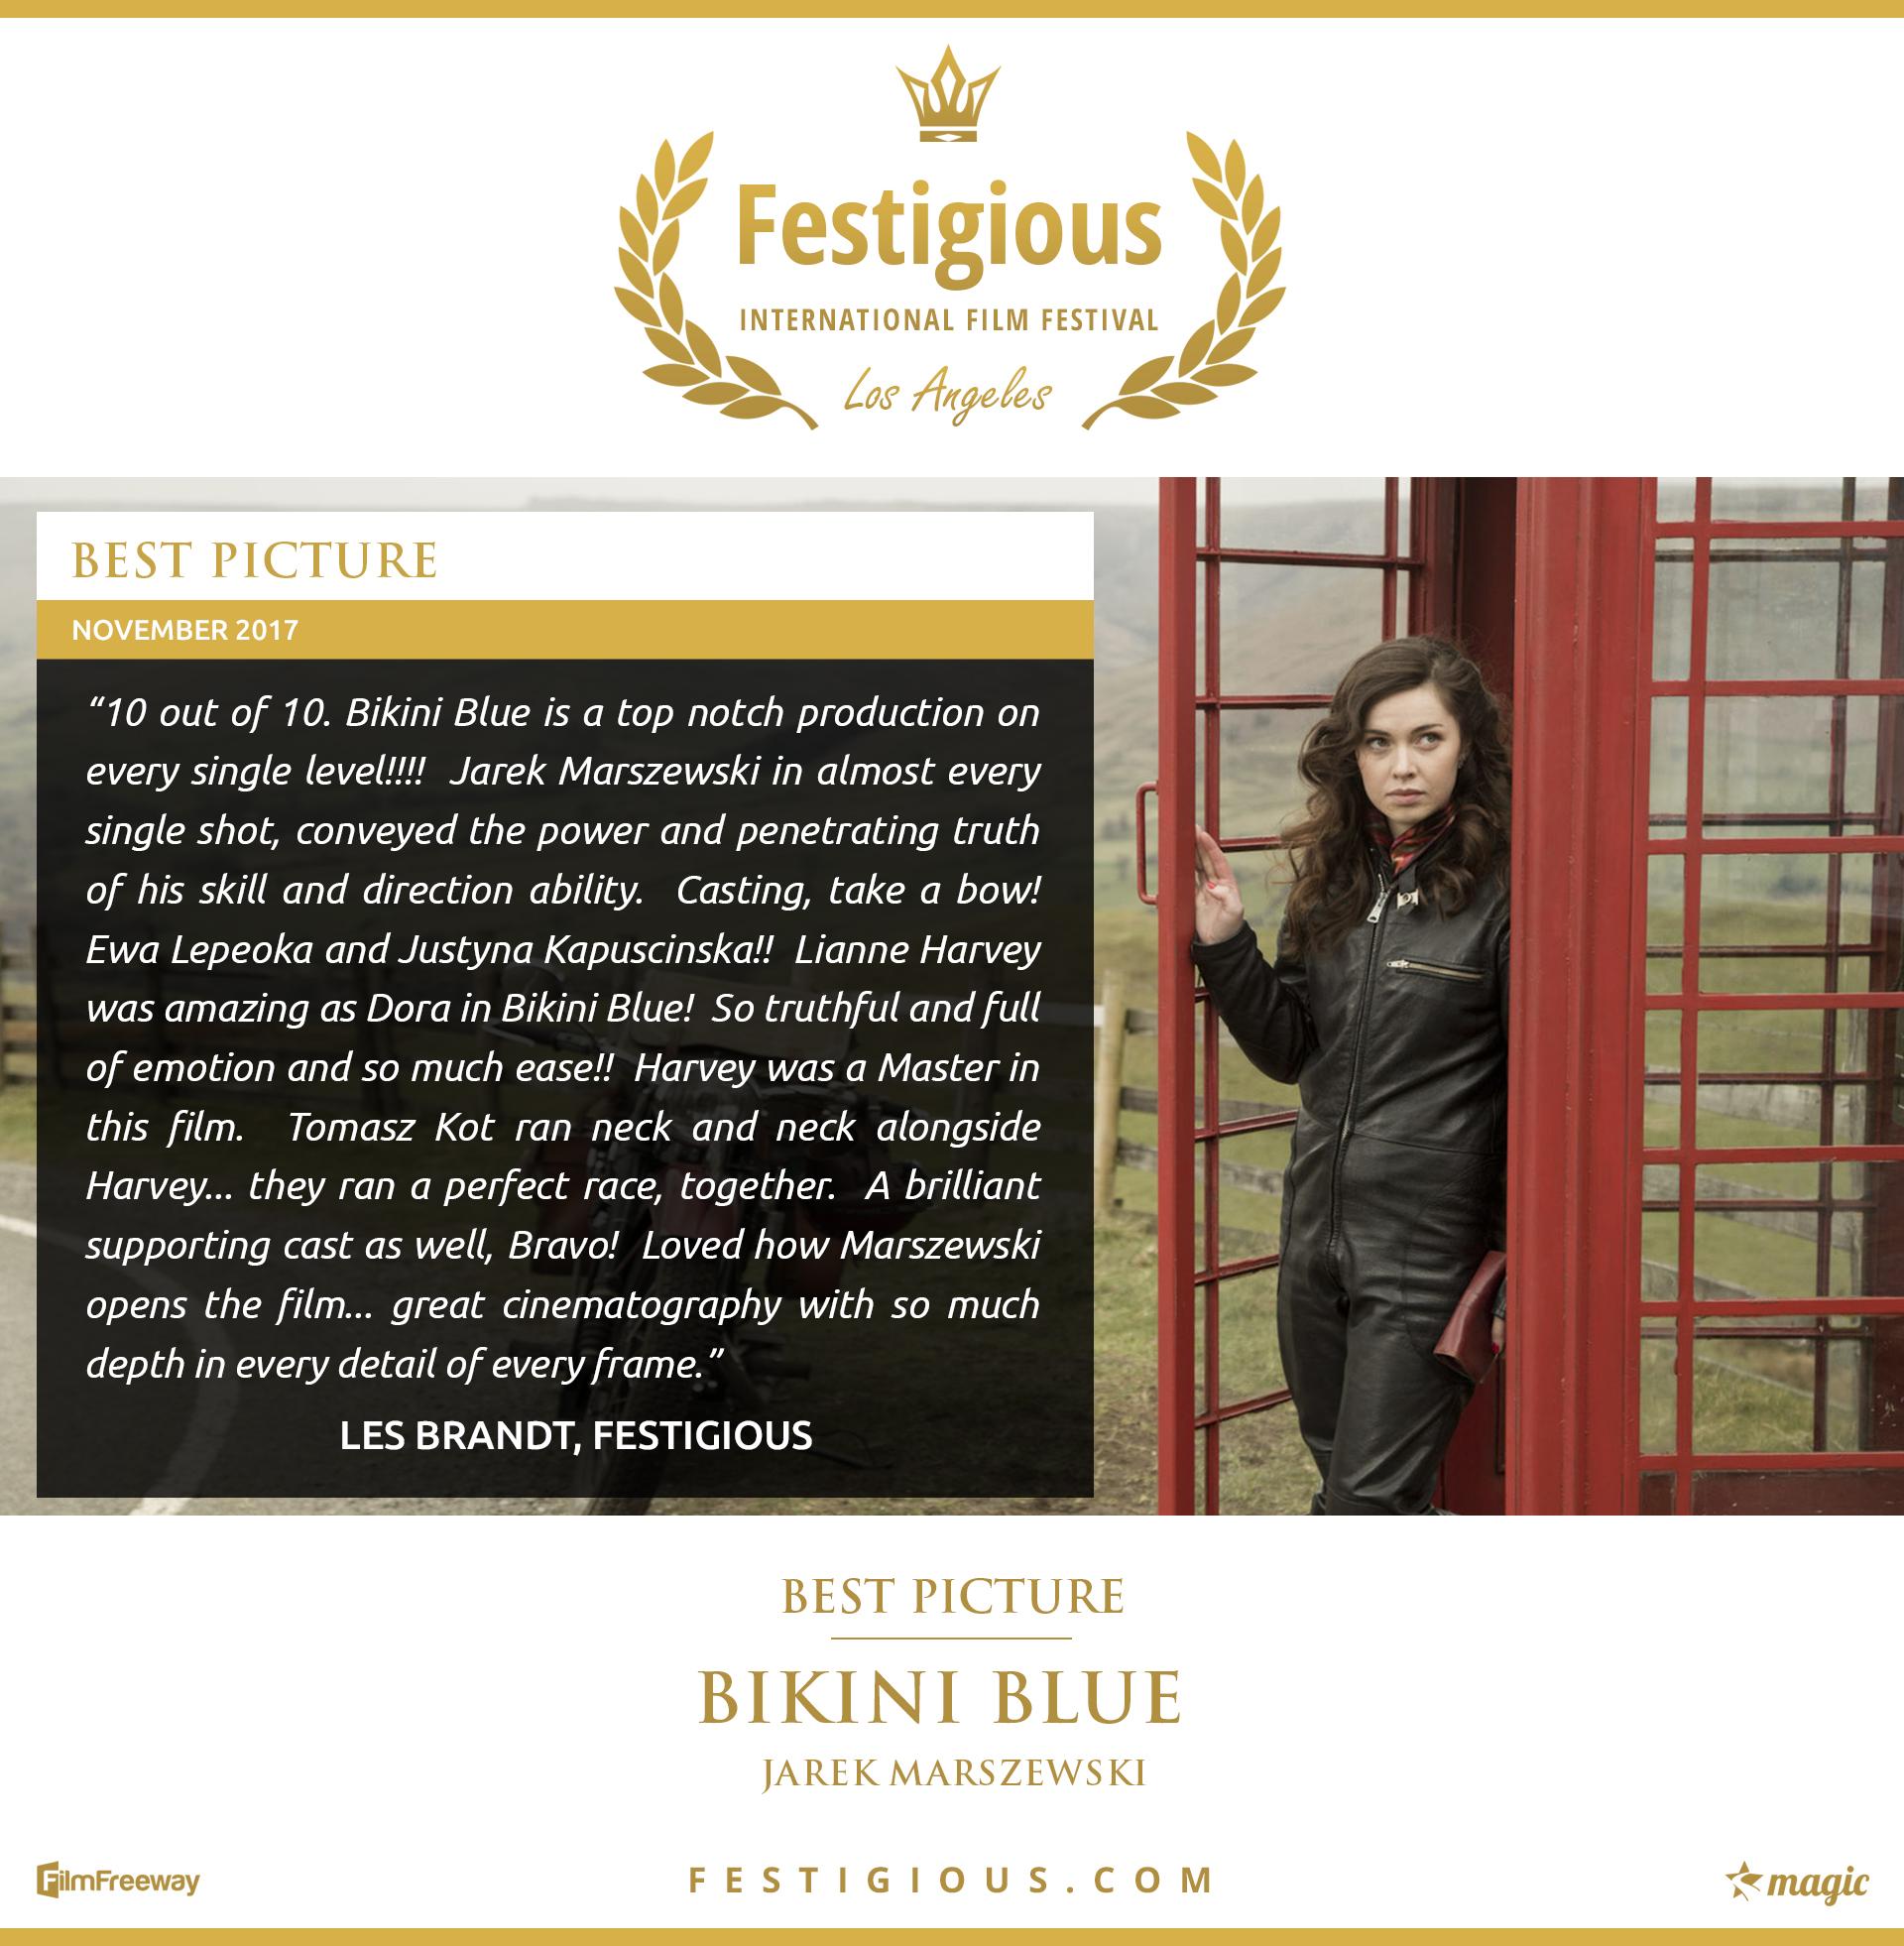 Bikini Blue - Festigious Best Picture - 2017 11